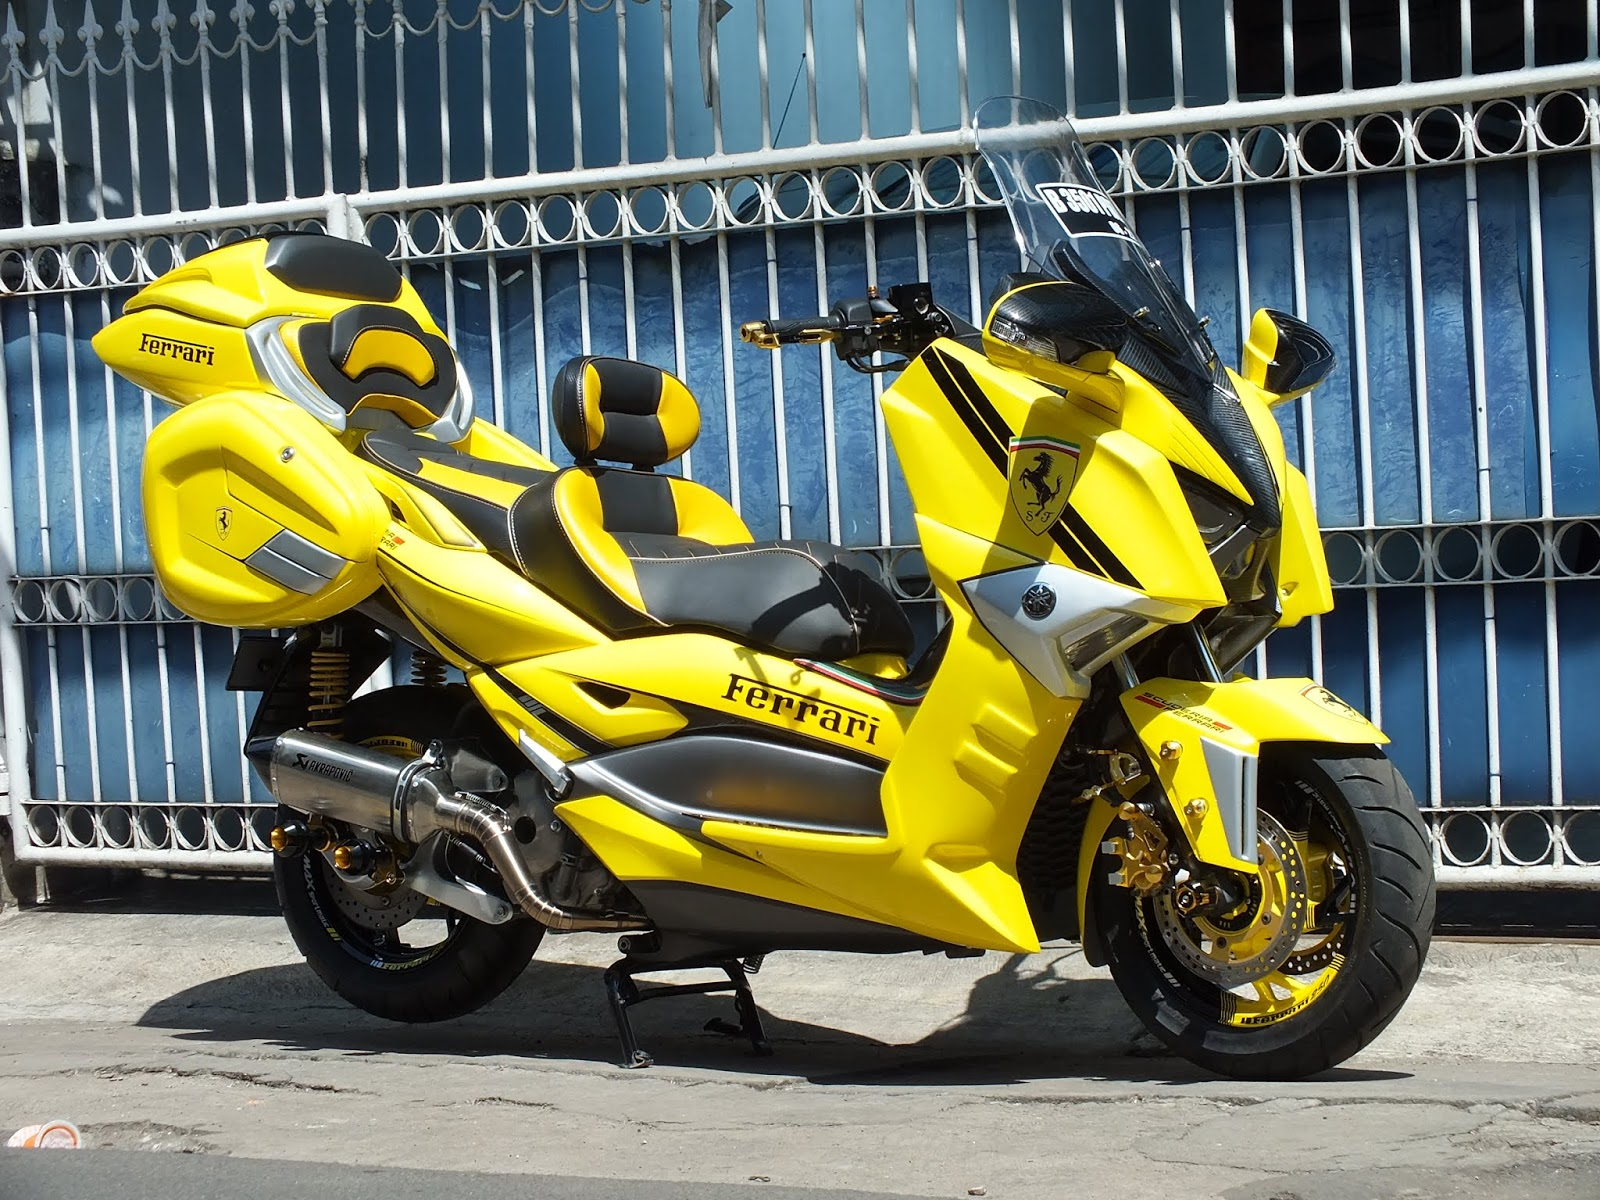 Koleksi Modifikasi Yamaha Xmax